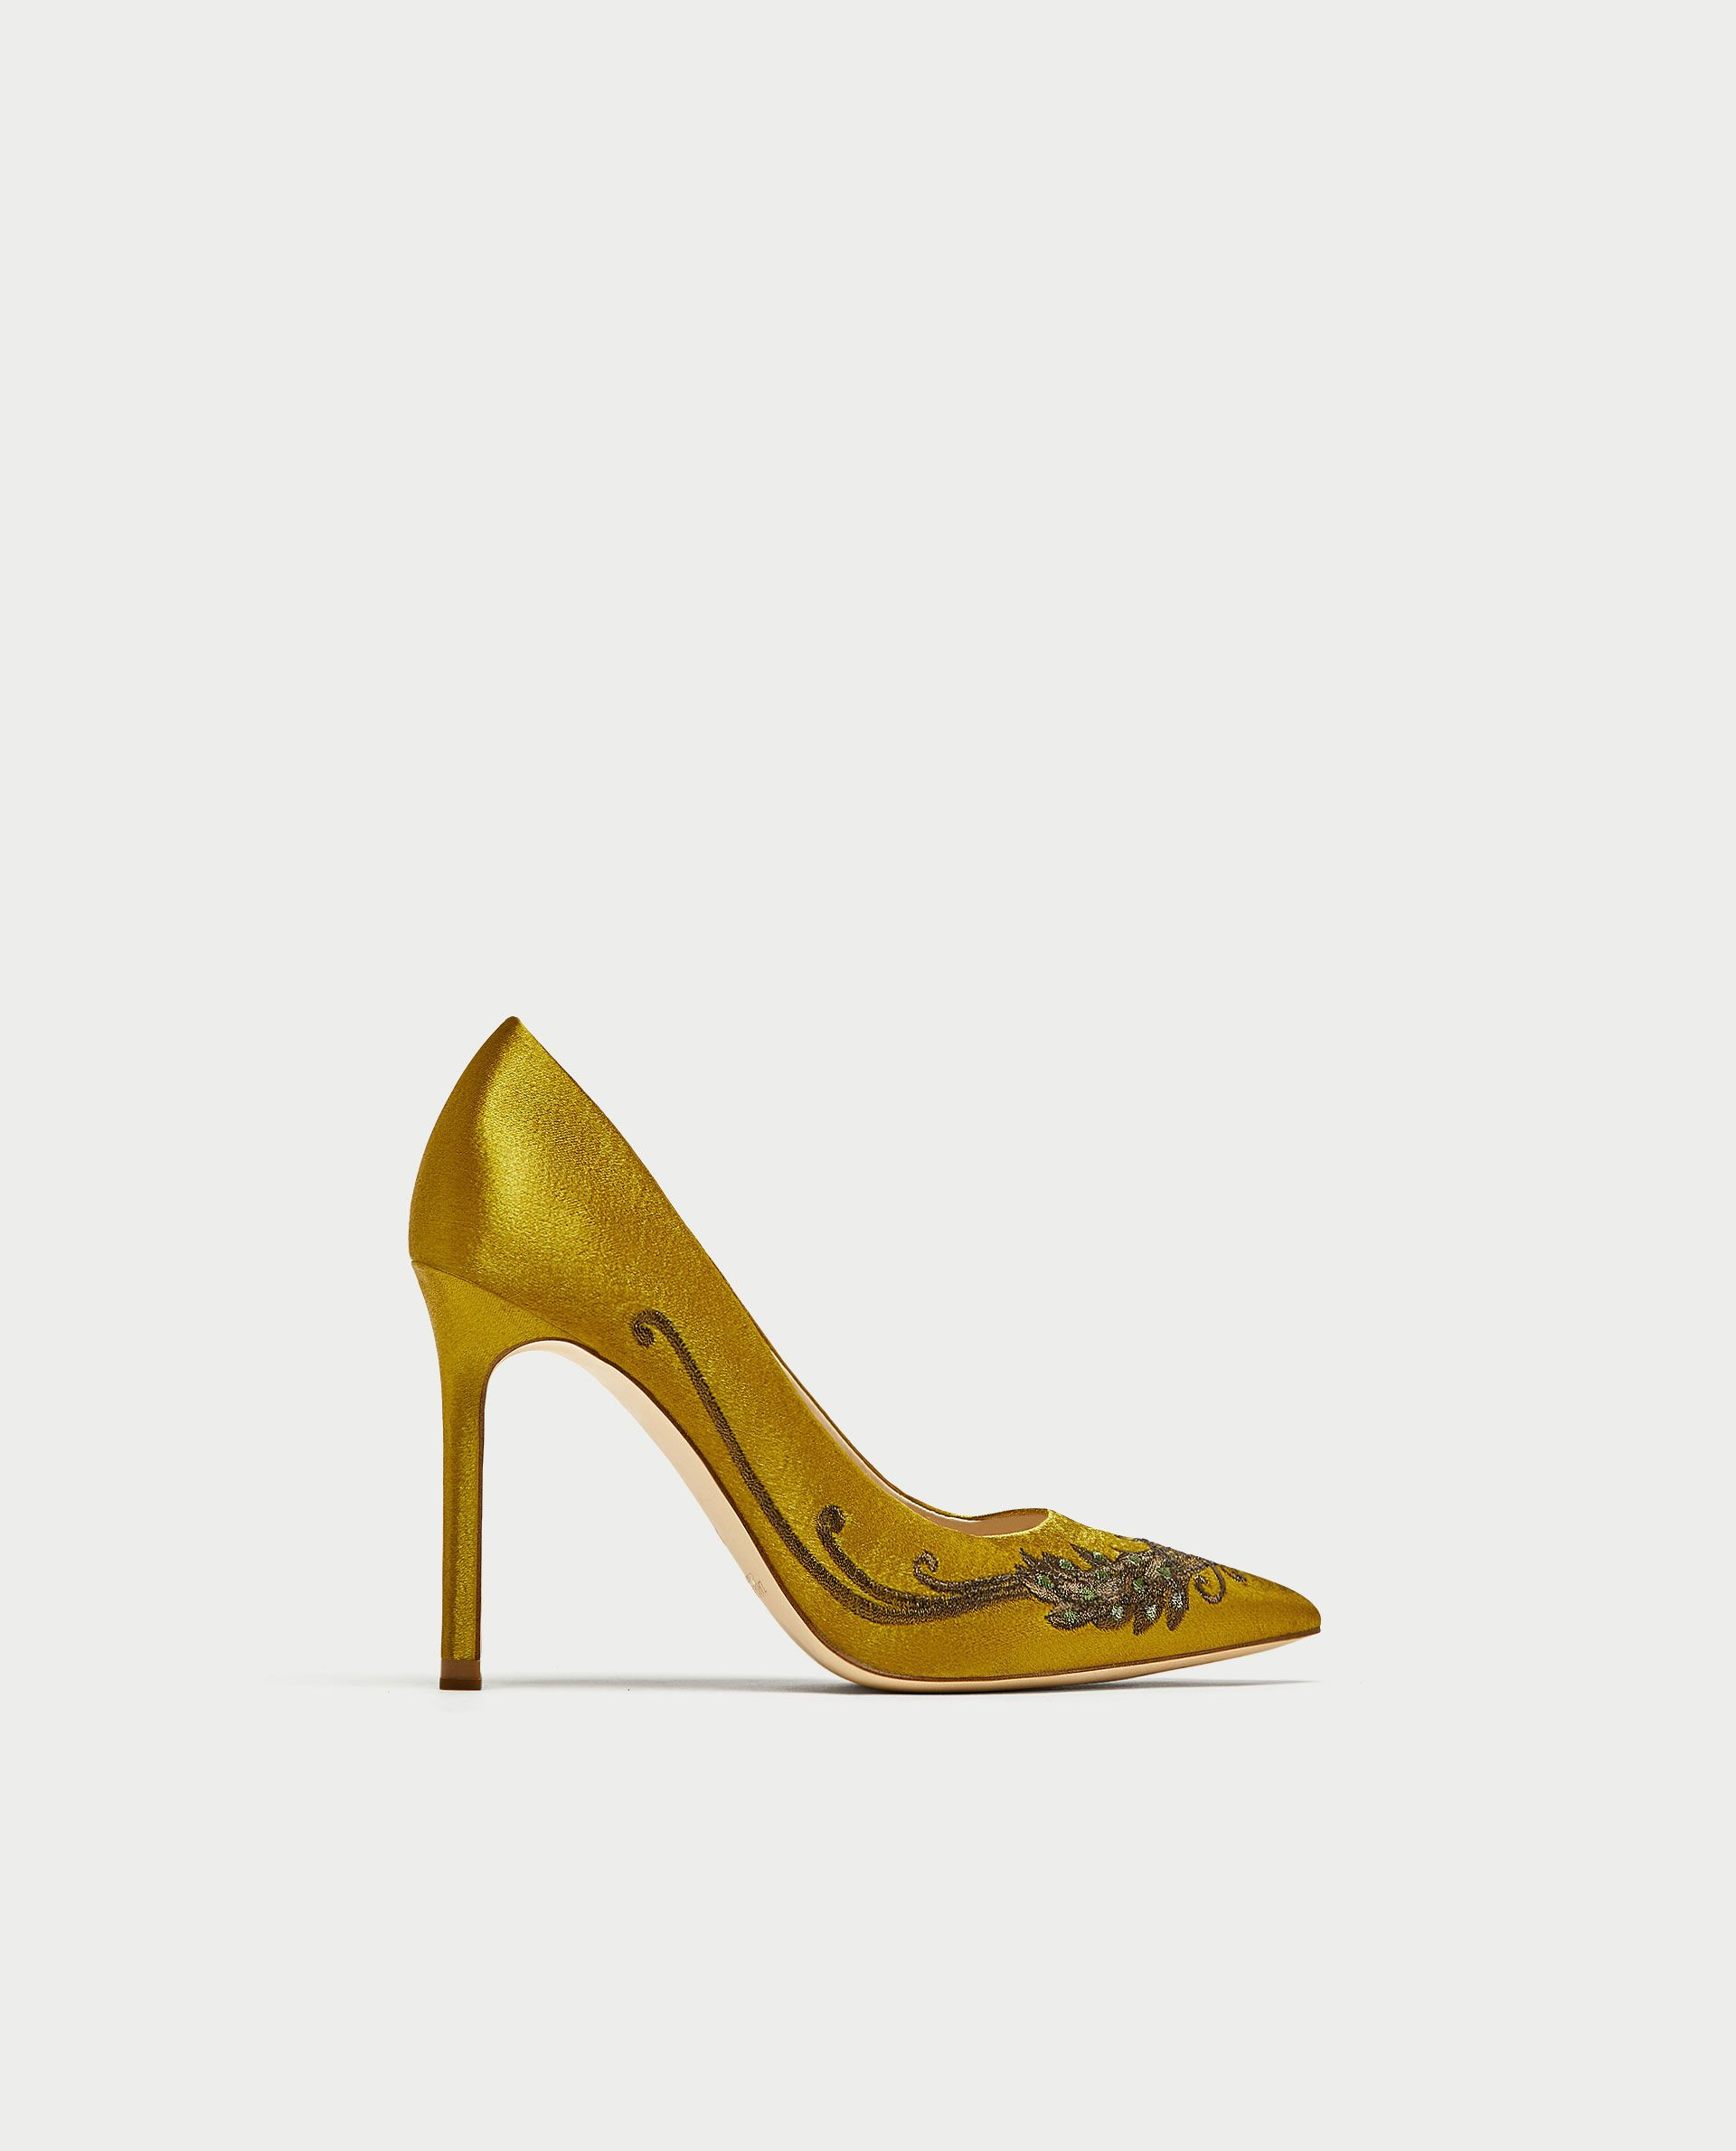 SATIN Schuhe COURT Schuhe SATIN WITH EMBROIDEROT BEADING   Footsi   Pinterest   Satin c2a182